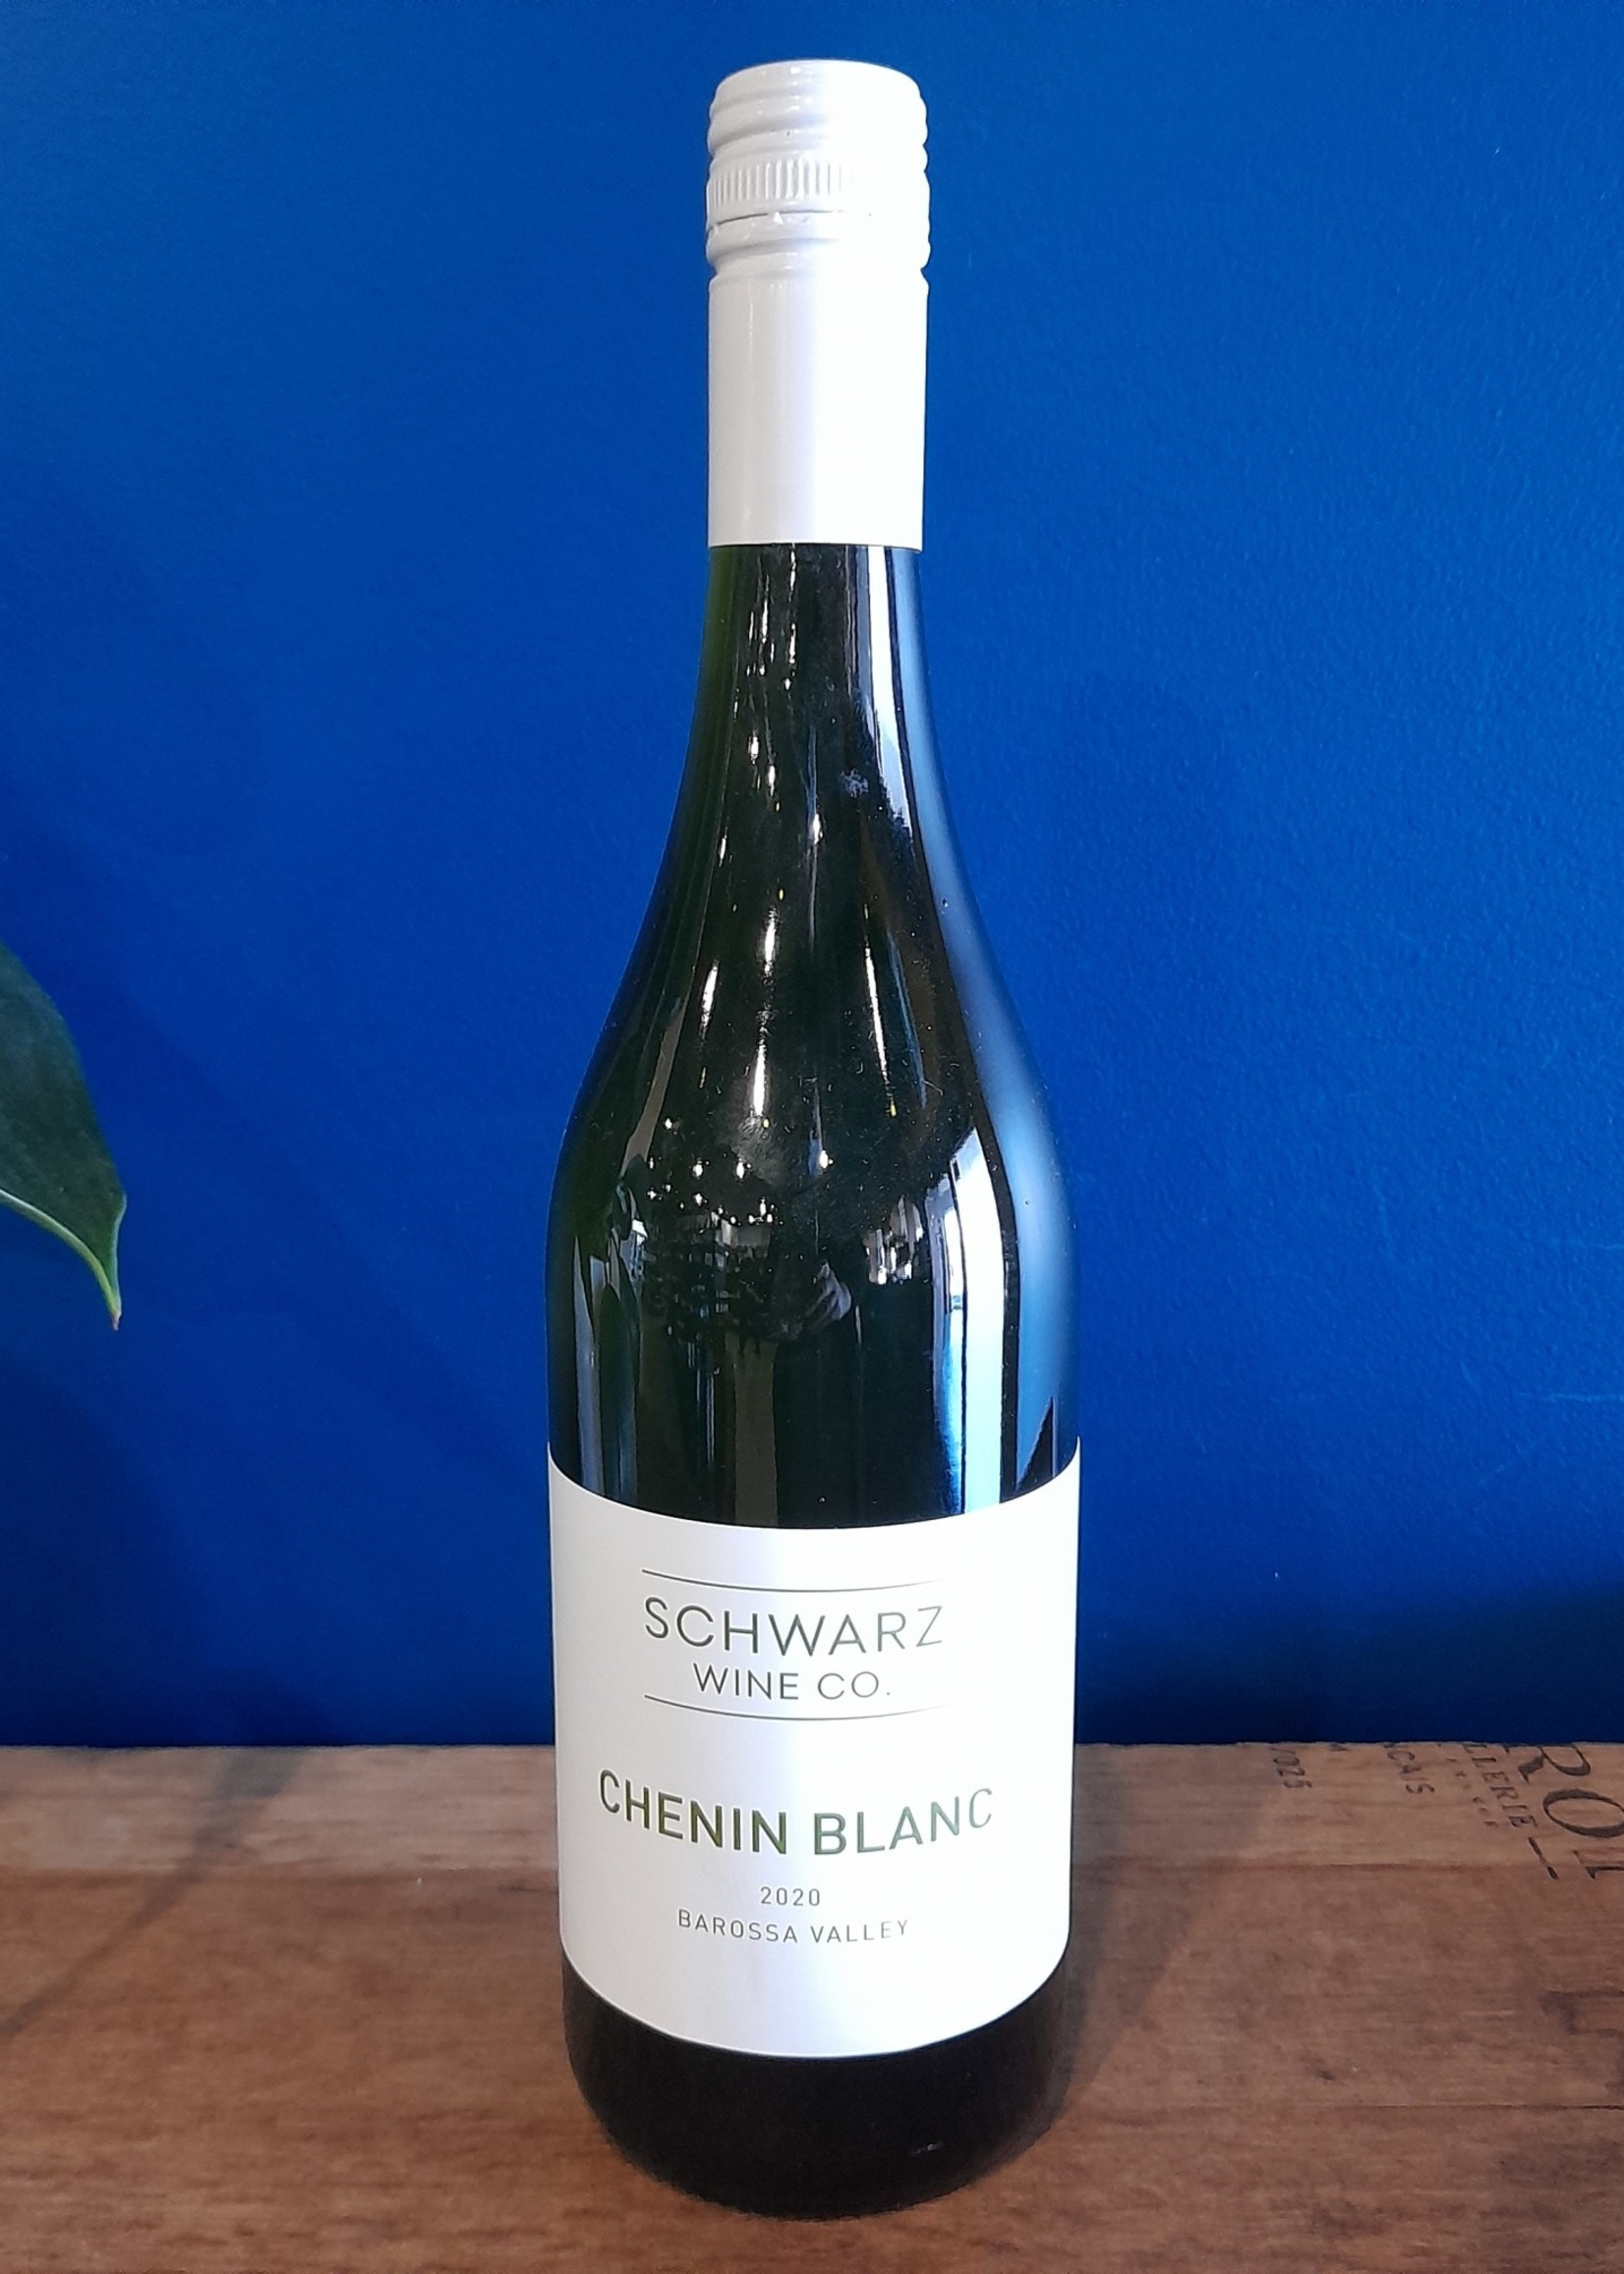 Schwarz Wine Co Schwarz Chenin Blanc 2020